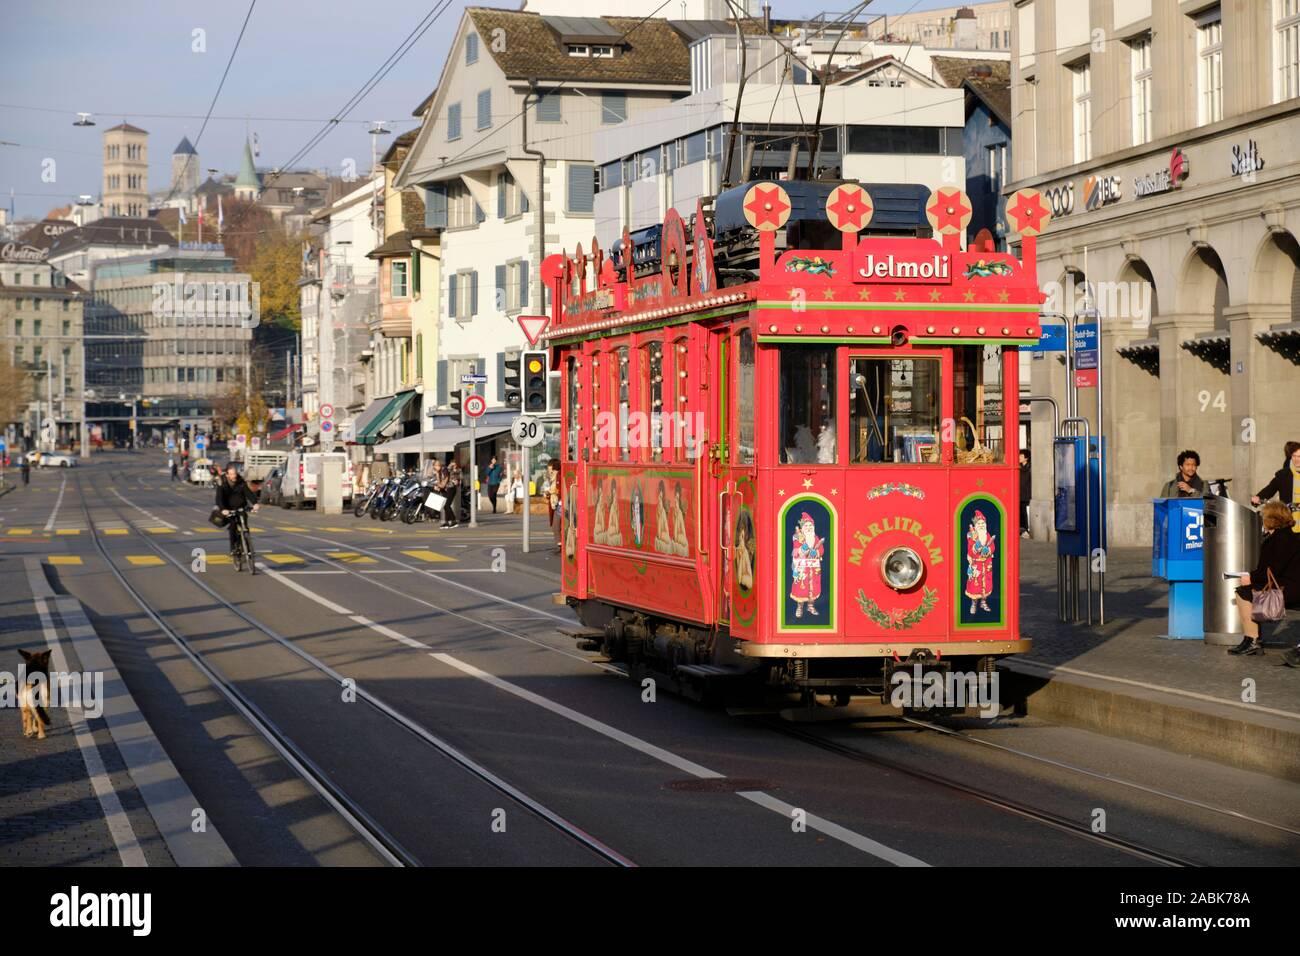 the-marlitram-streetcar-a-christmas-festive-tram-going-along-on-the-sun-lit-street-along-the-river-side-of-zurich-switzerland-2ABK78A.jpg